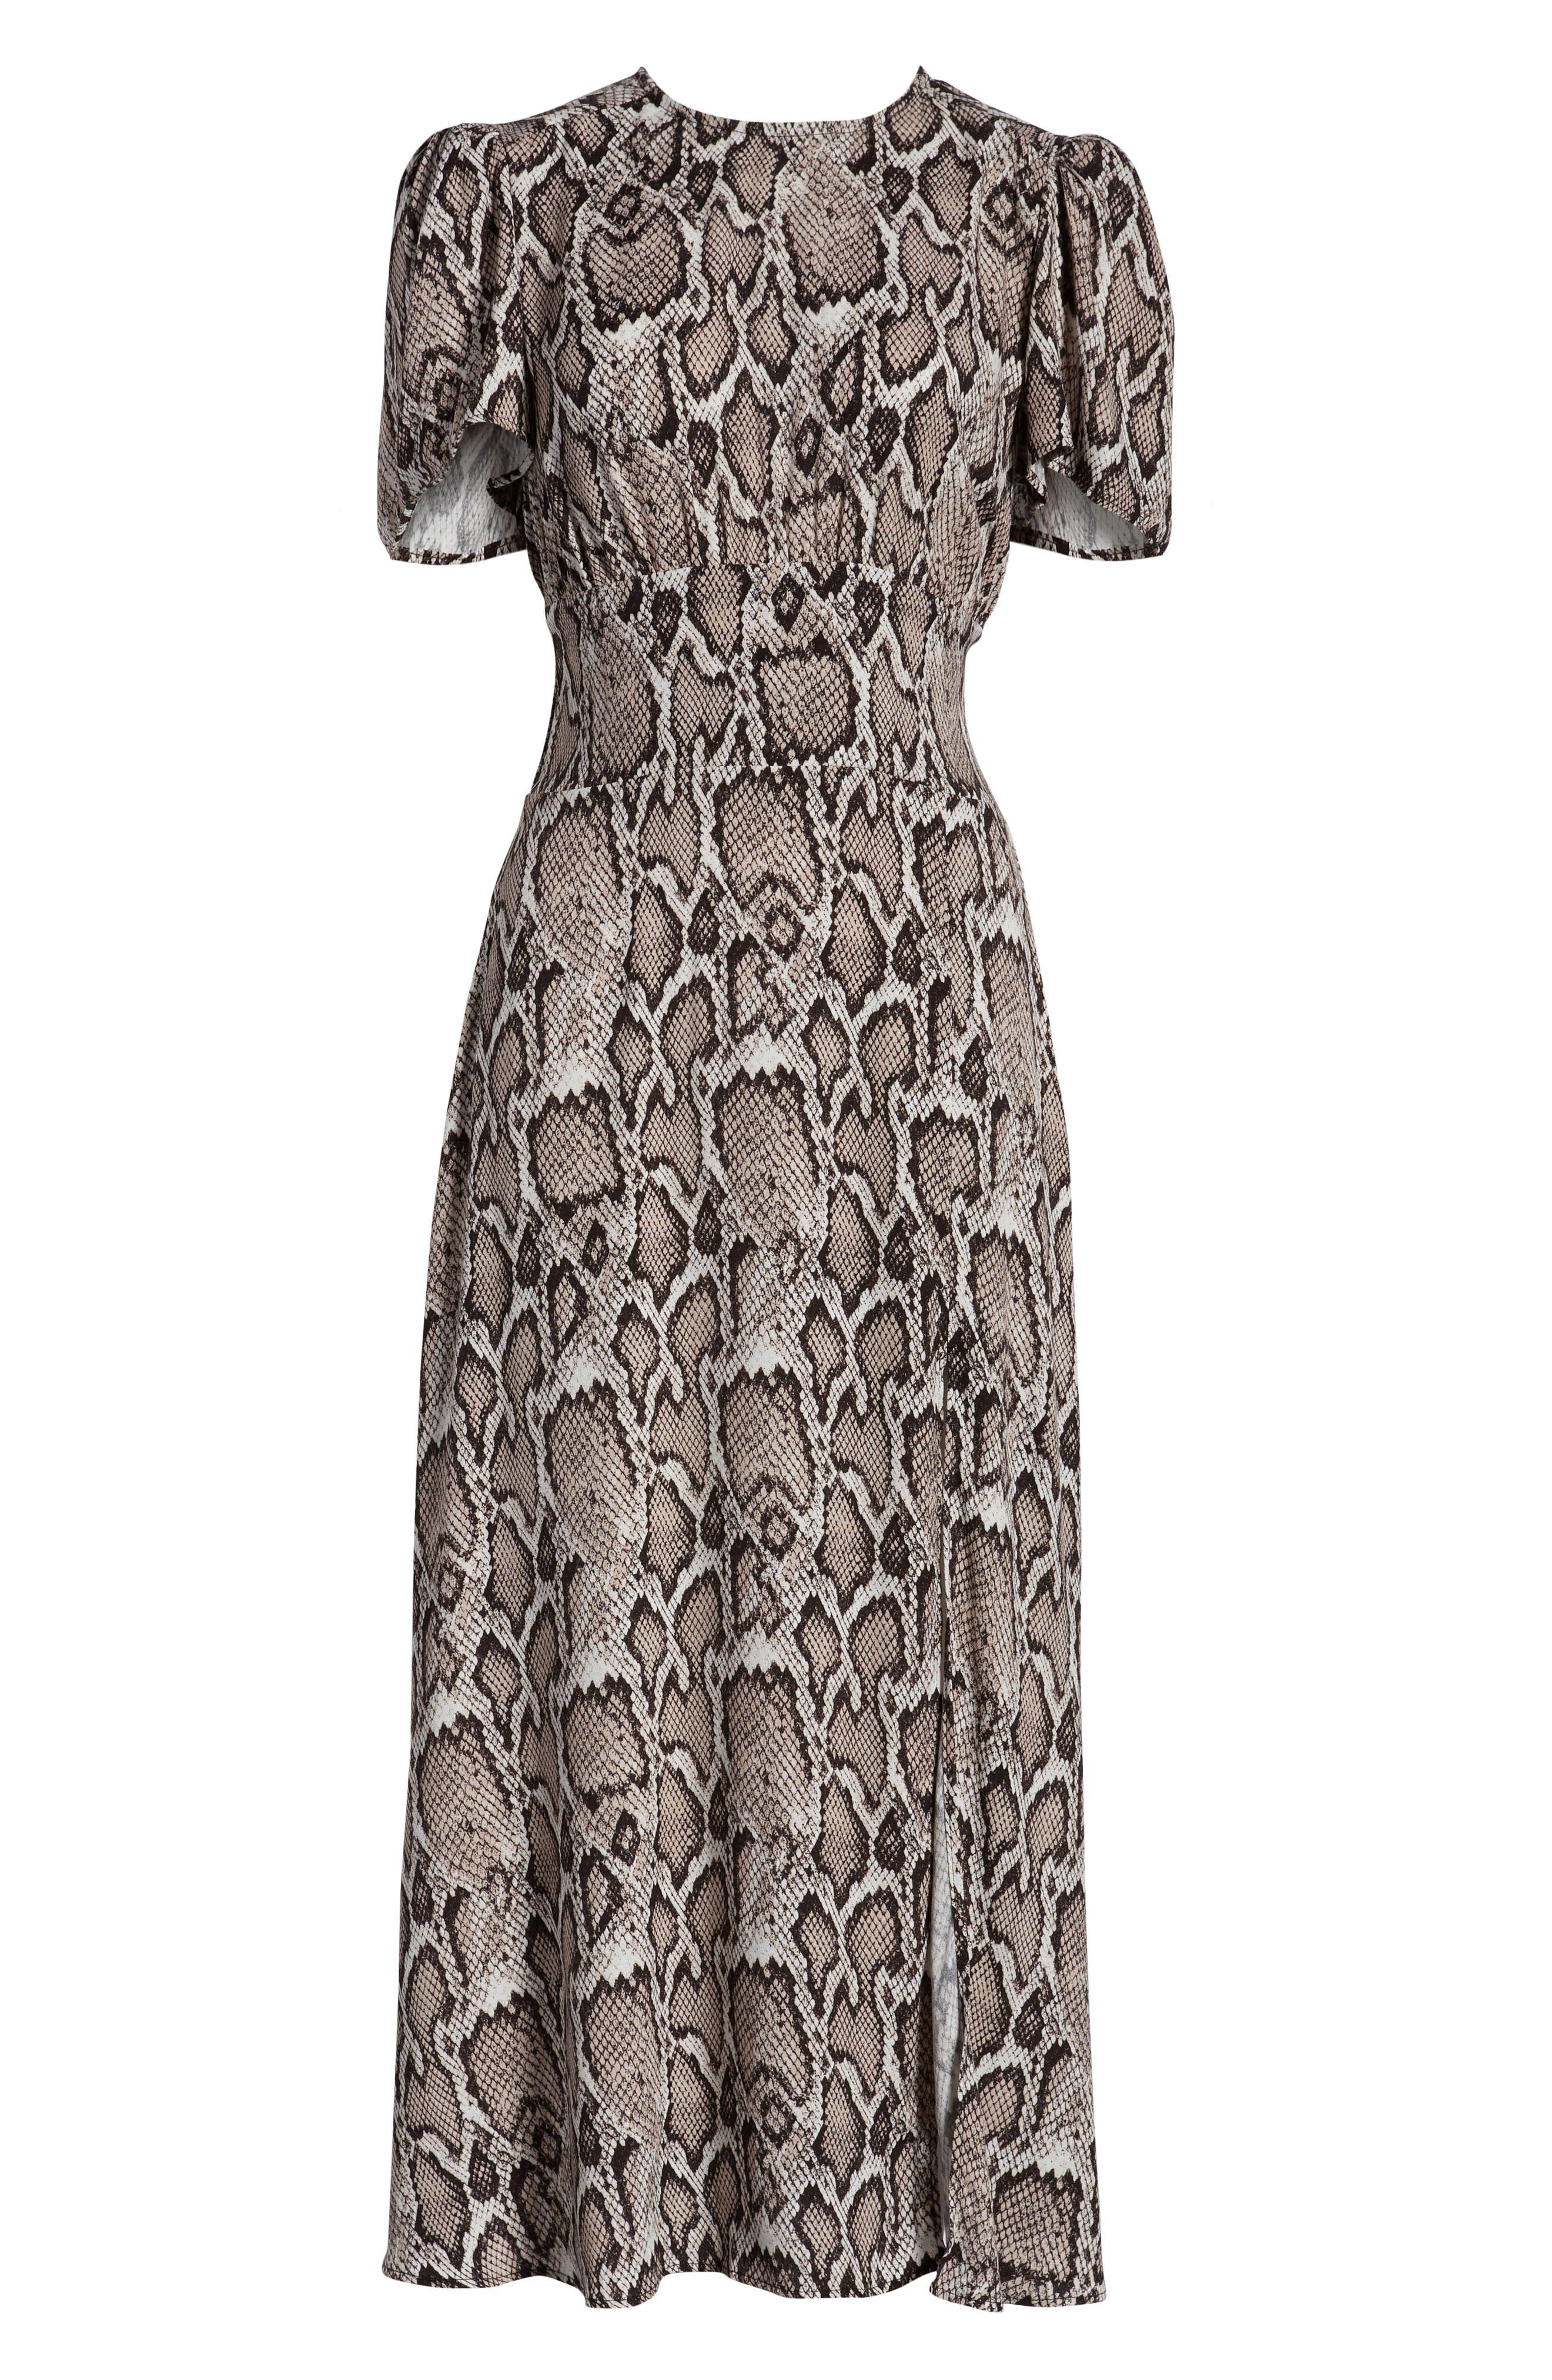 AFRM, Lala Midi Dress, Alternate thumbnail 7, color, SNAKESKIN